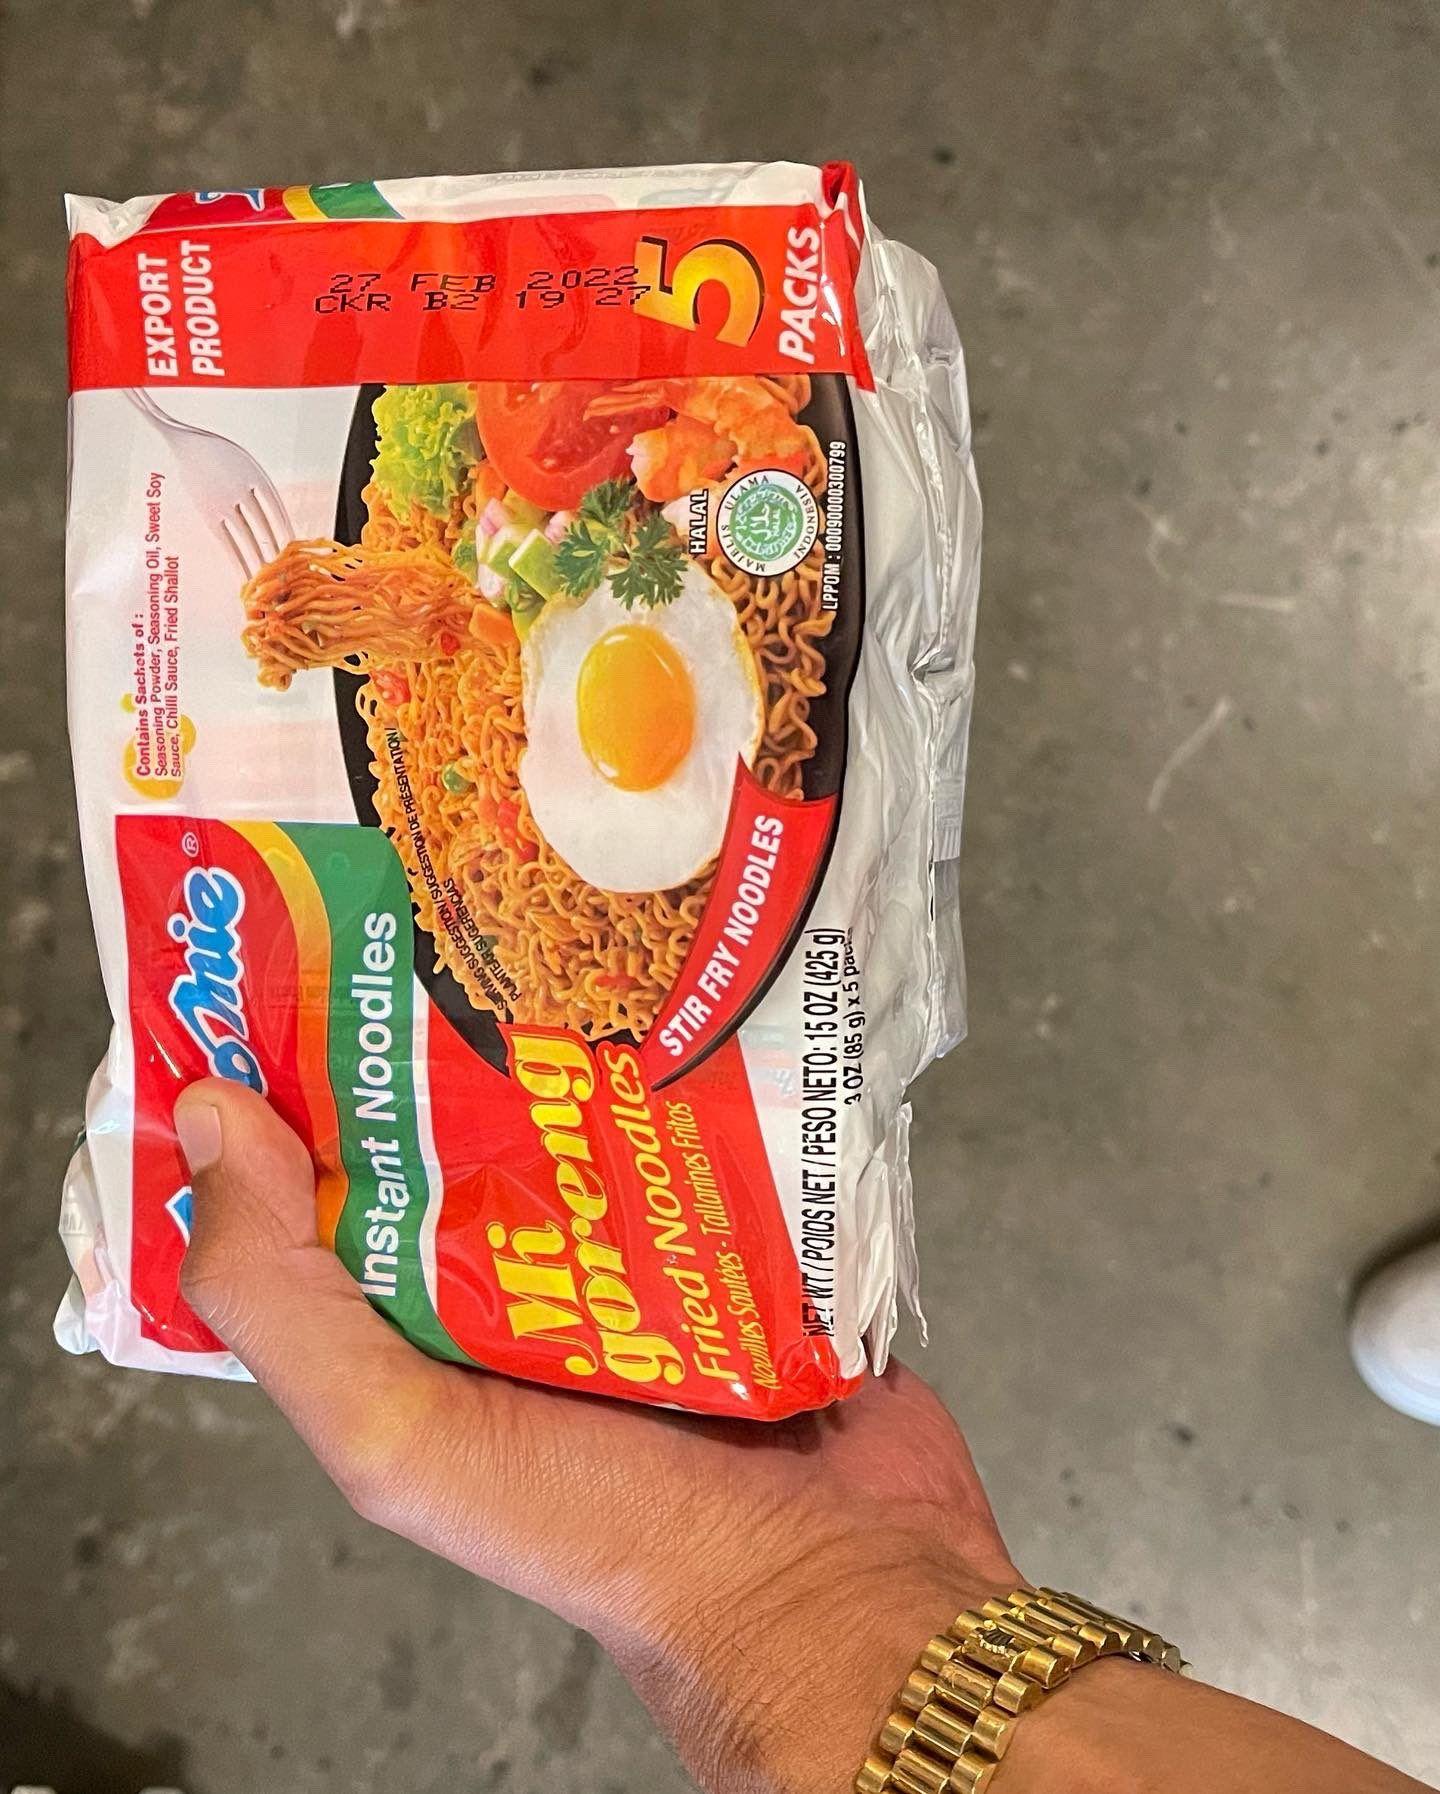 DJ Yellow Claw Pamer Makan Nasi Warteg dan Indomie di Los Angeles, Netizen Heboh